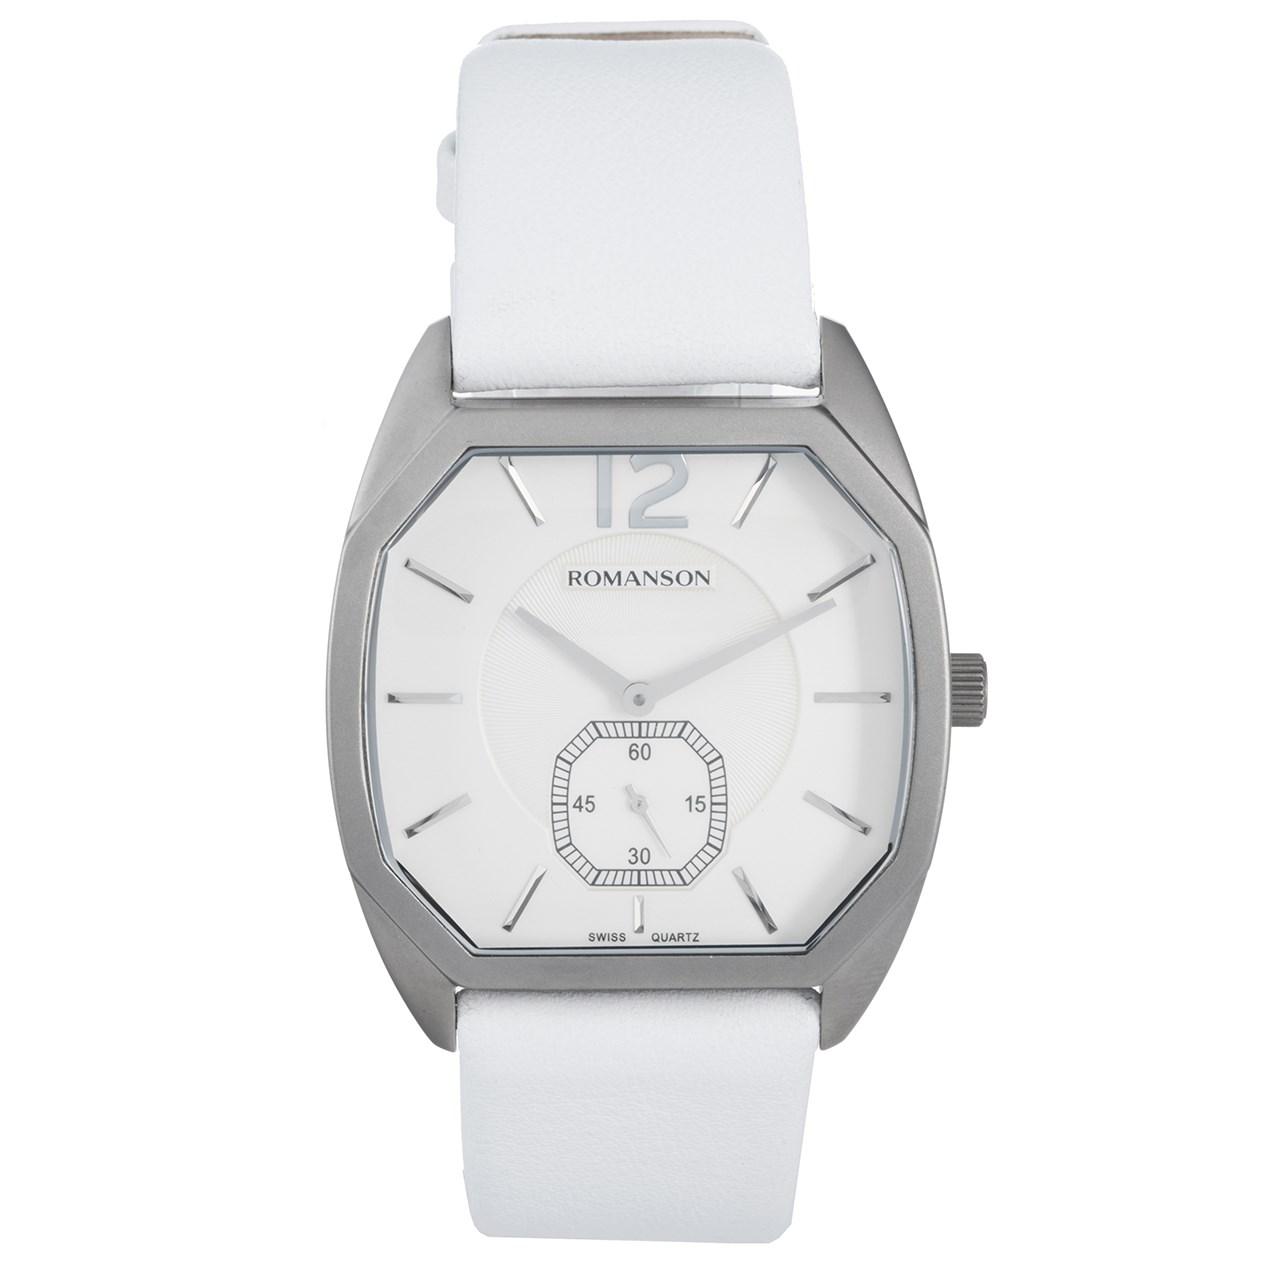 ساعت مچی عقربه ای مردانه رومانسون مدل TL1247MM1WAS2W 8